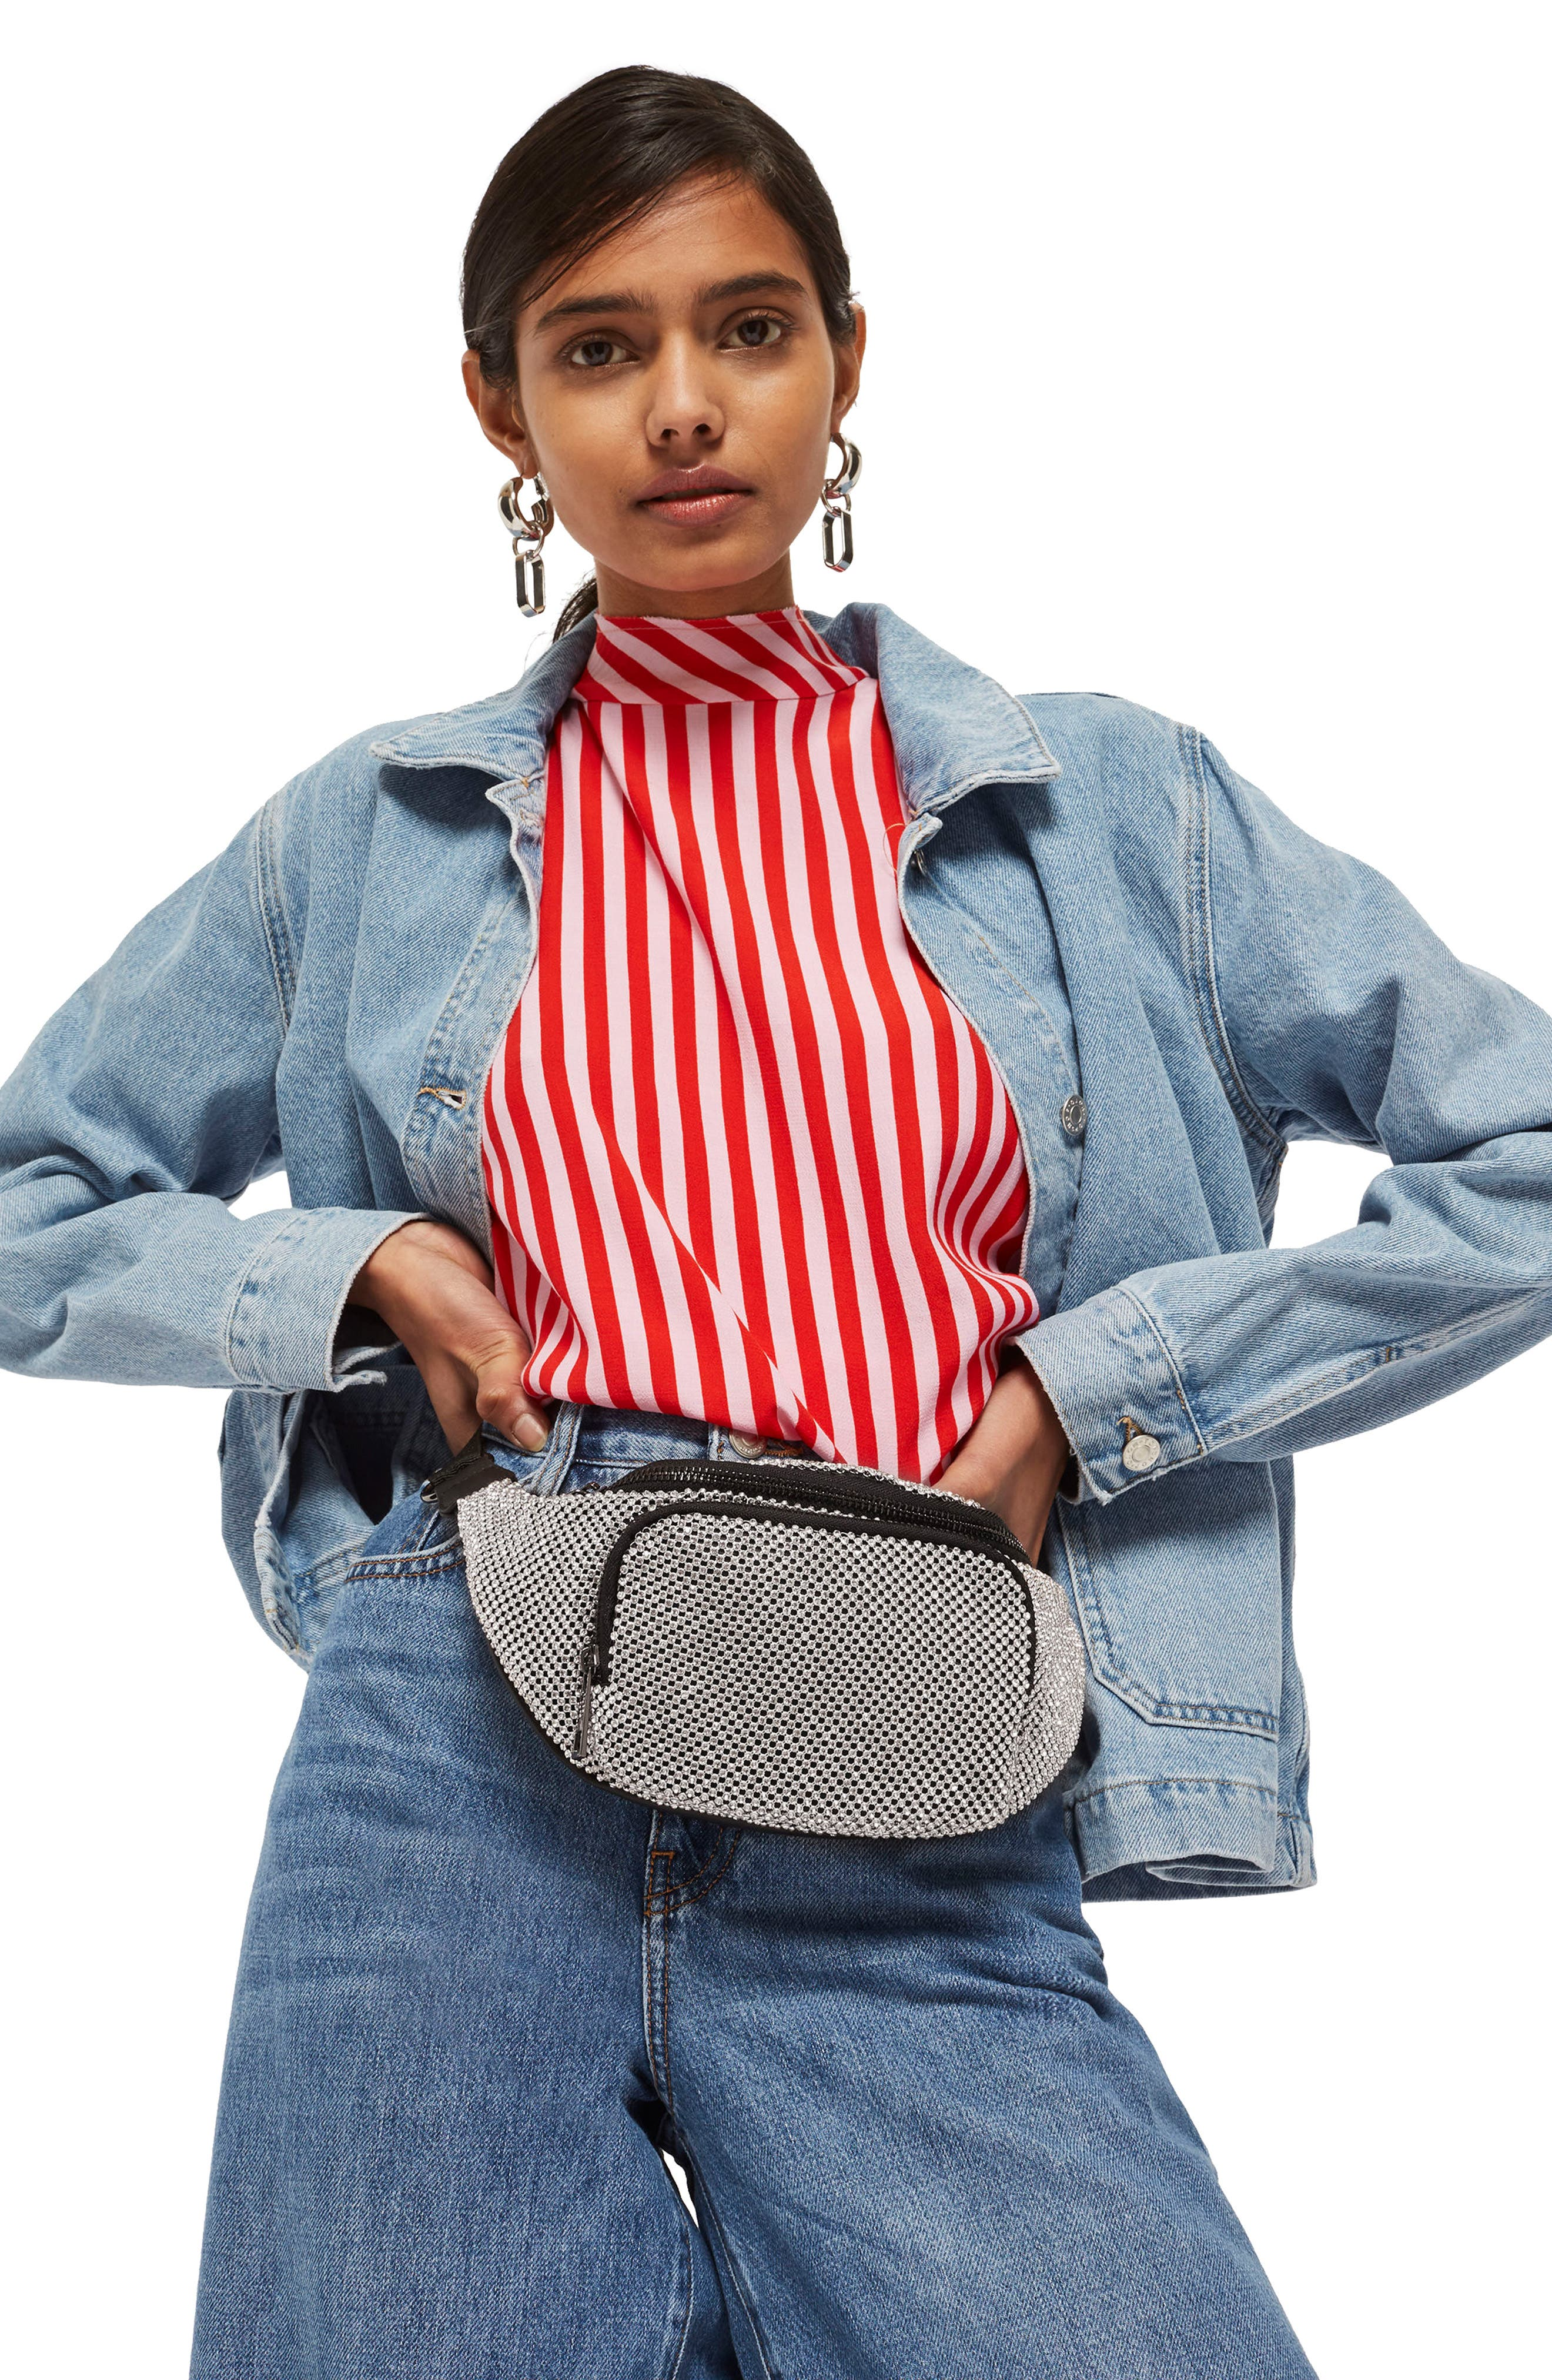 Diana Diamante Chainmail Bum Bag,                             Alternate thumbnail 2, color,